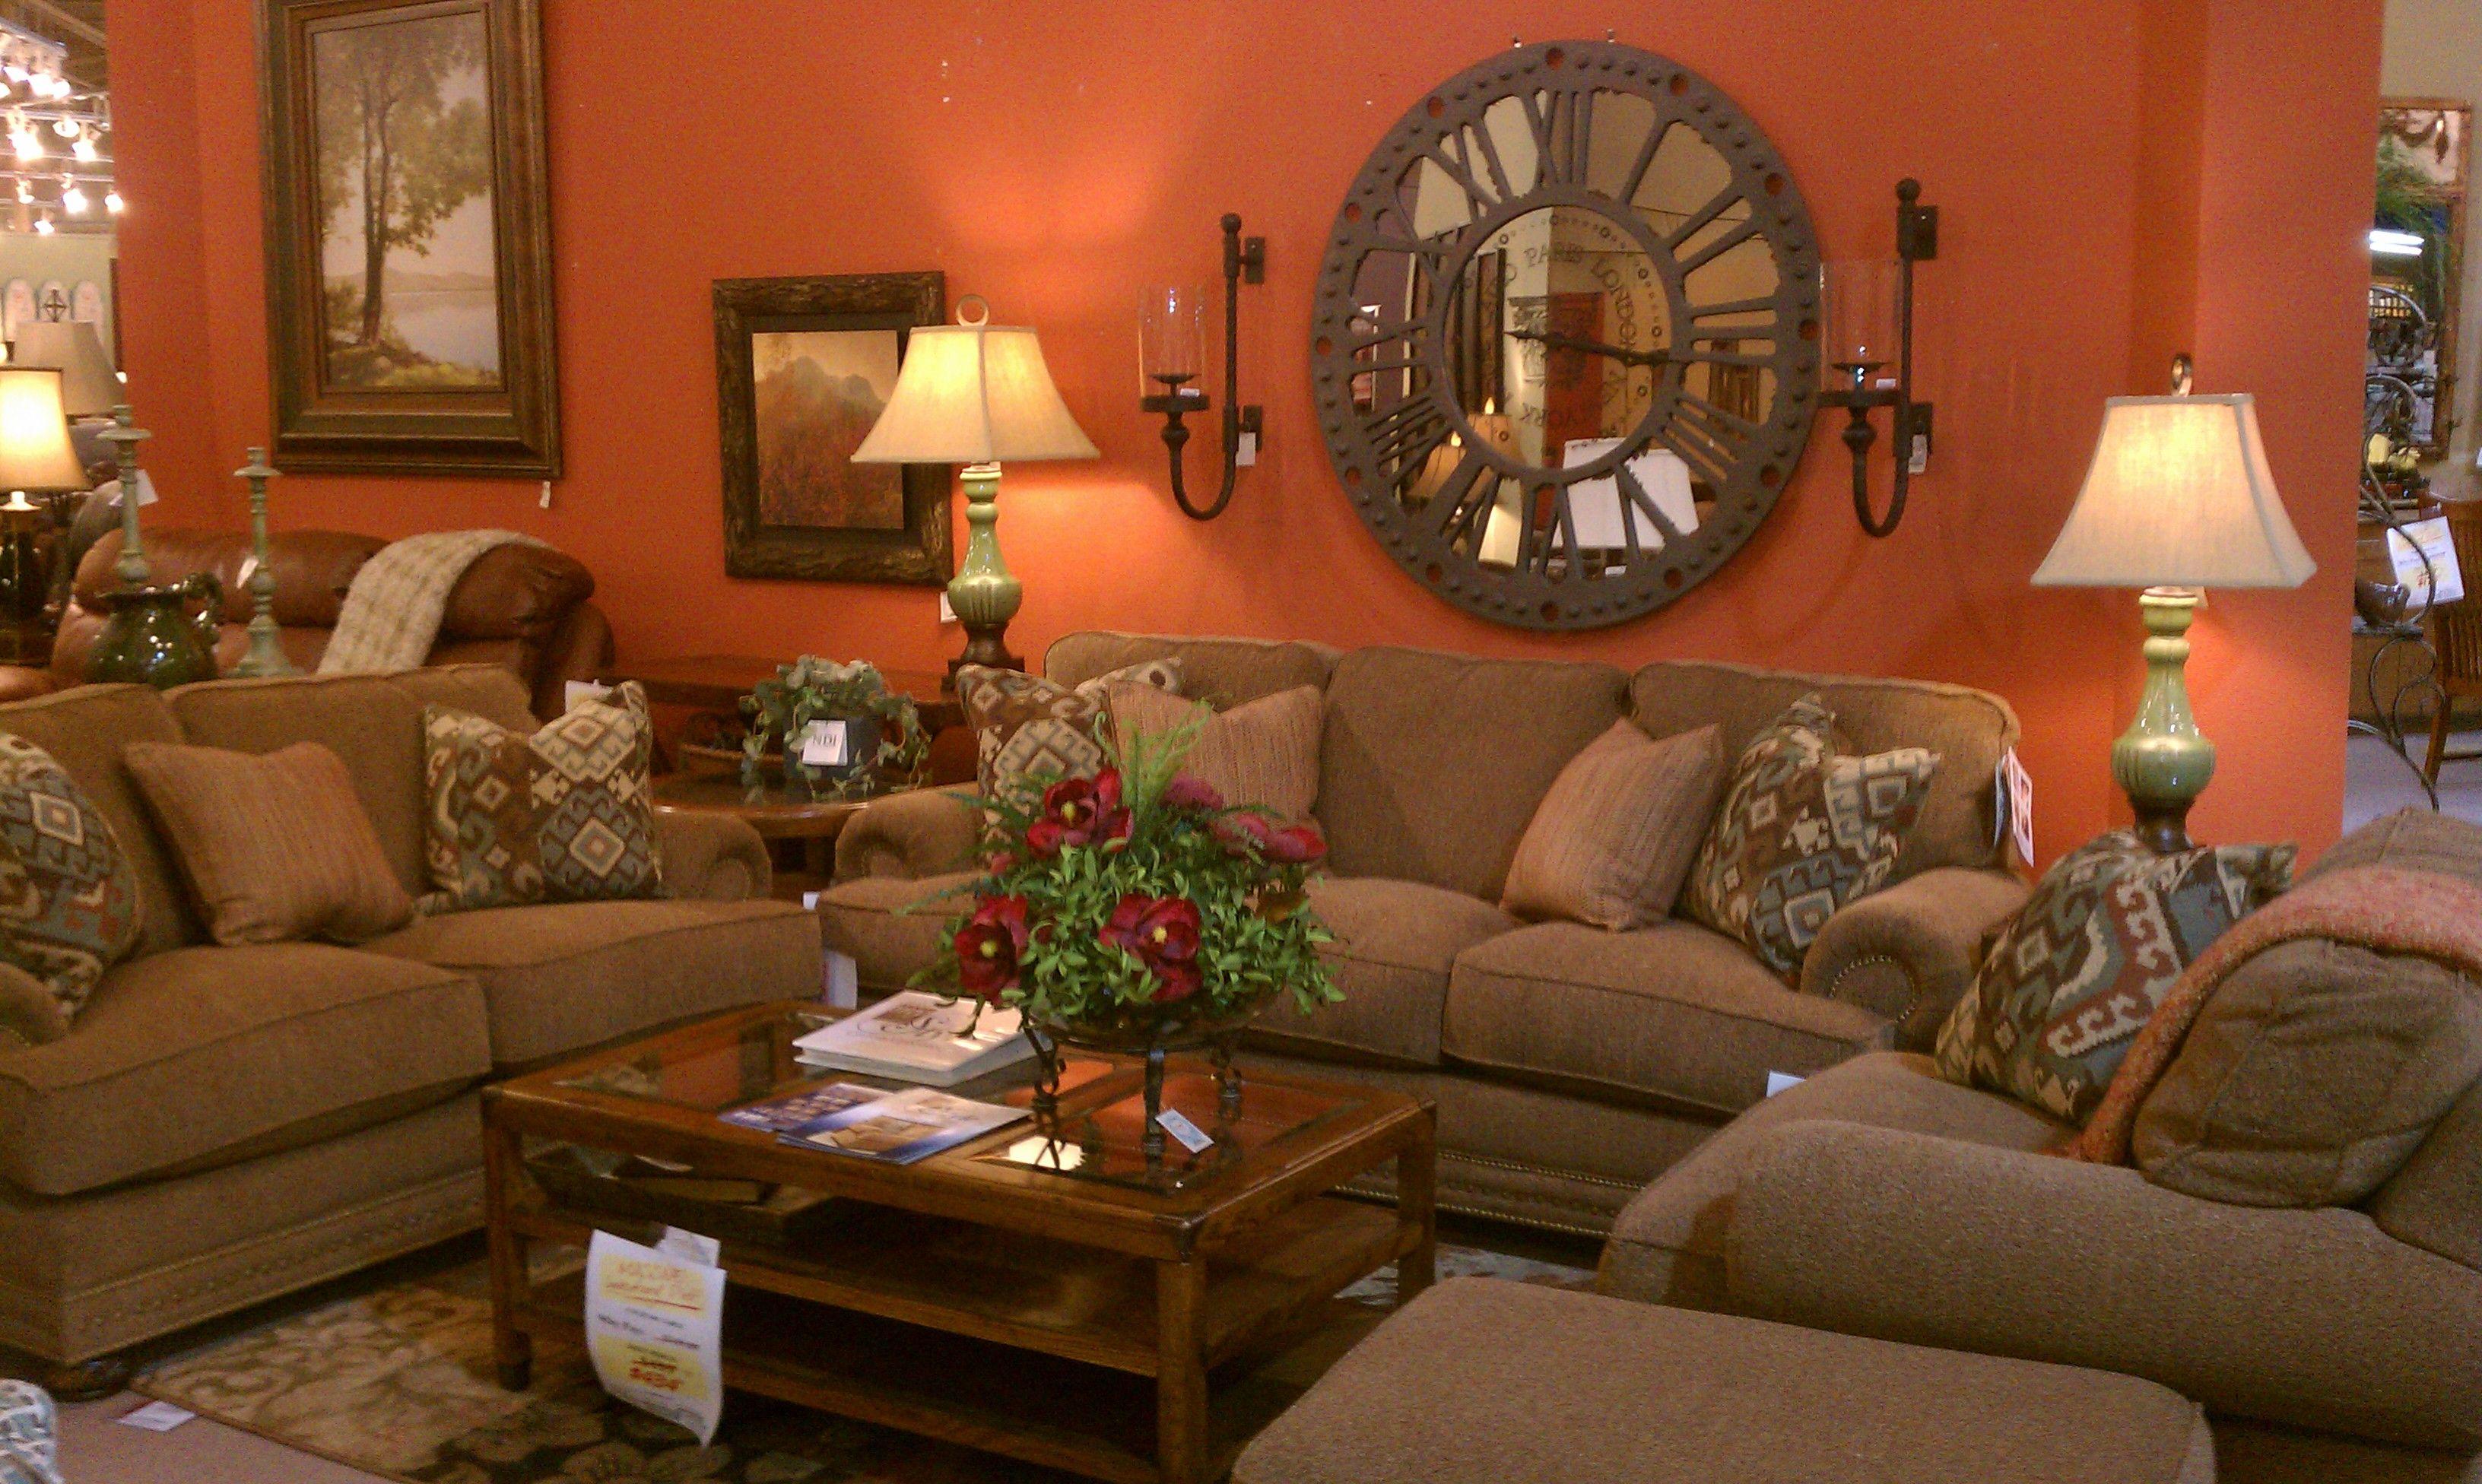 flexsteel my style sofa, loveseat and chair. option 2